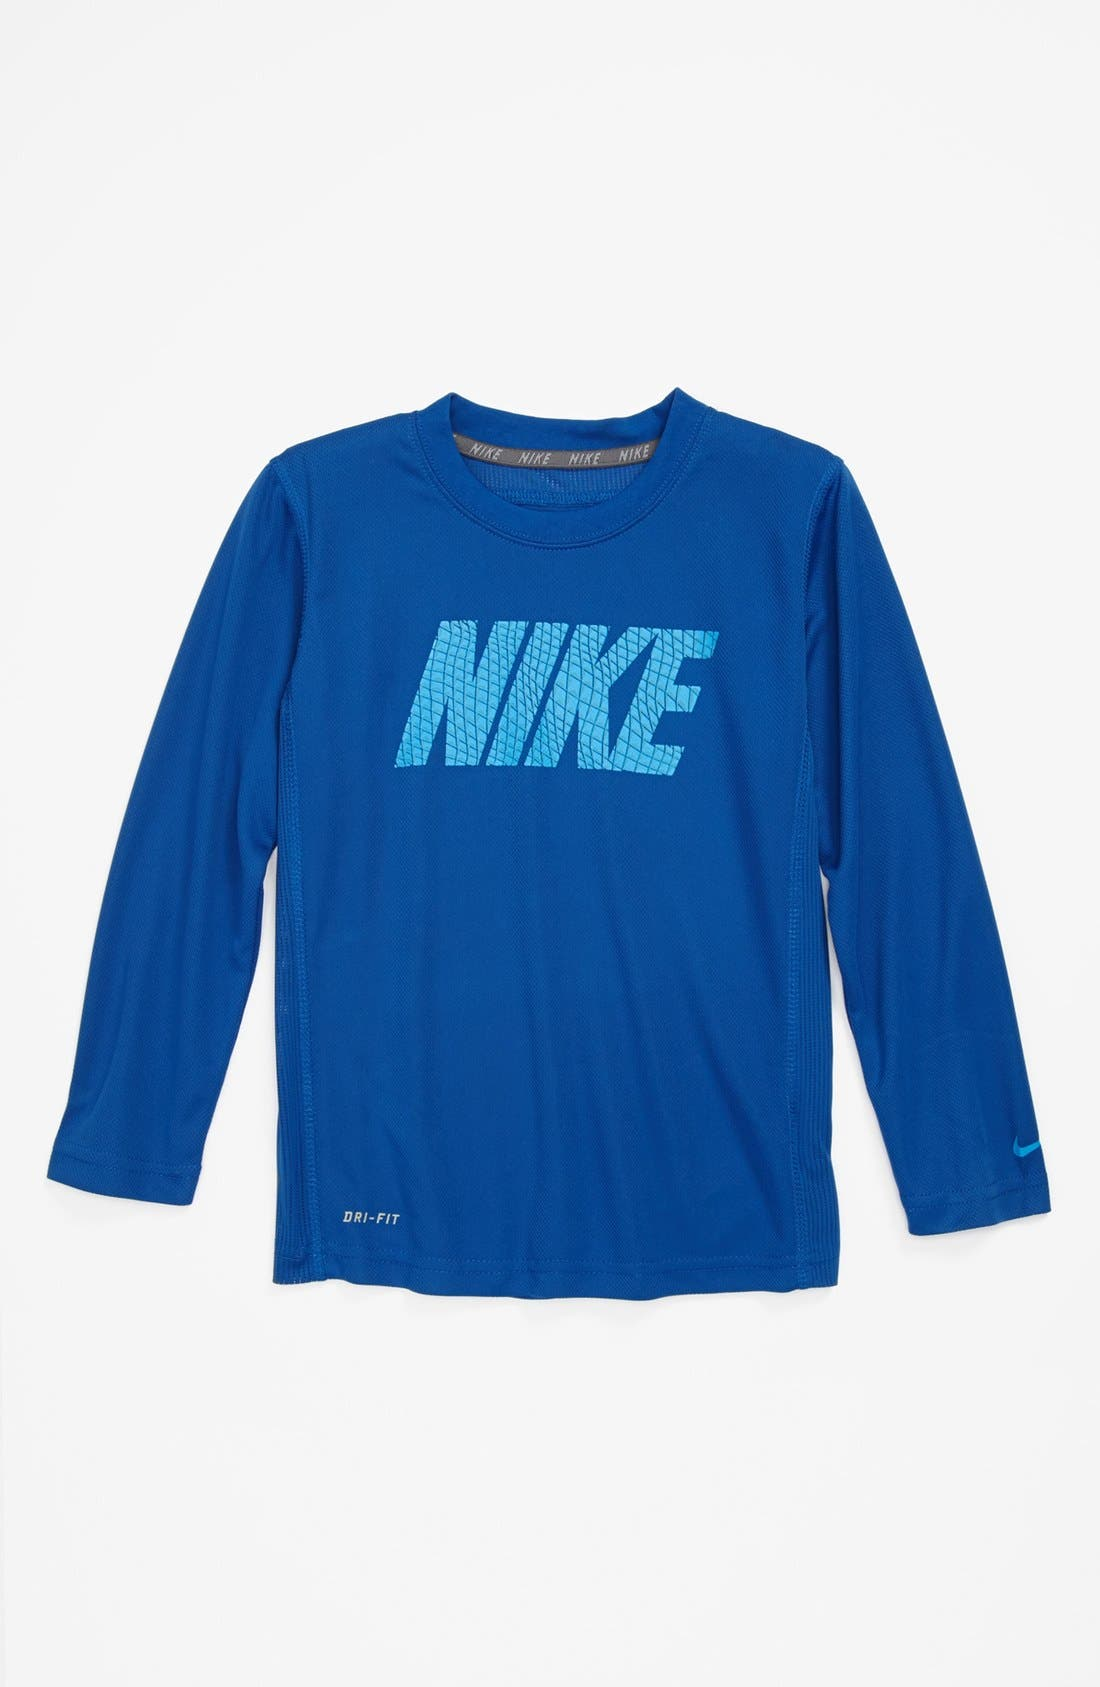 Main Image - Nike 'Speed Fly GFX' Dri-FIT Top (Little Boys)